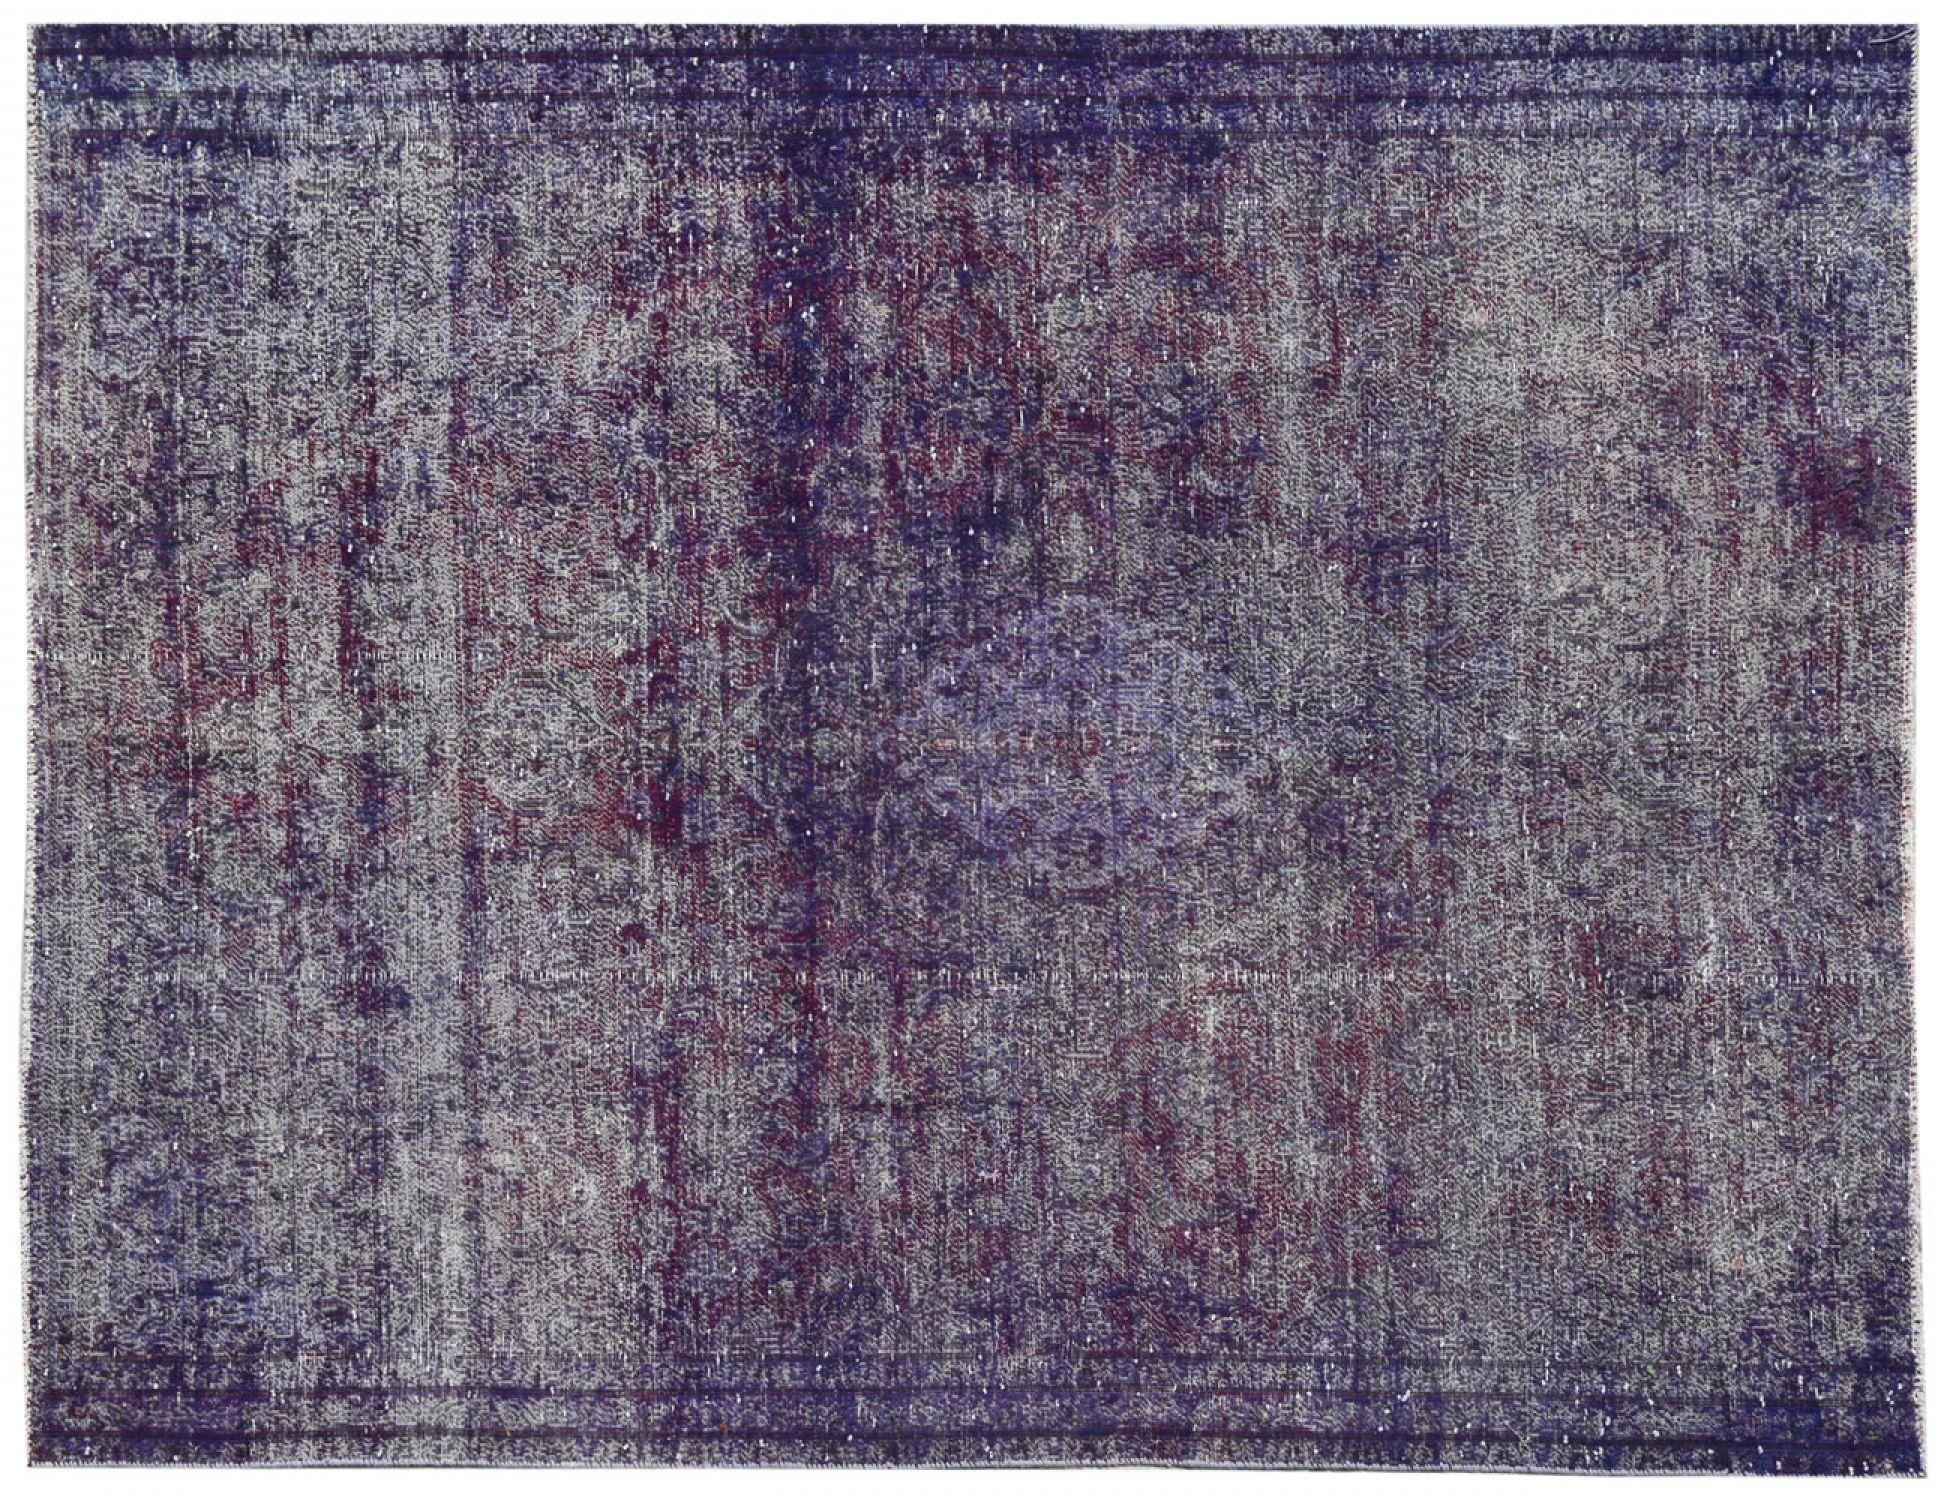 Vintage Carpet  violetti <br/>264 x 207 cm